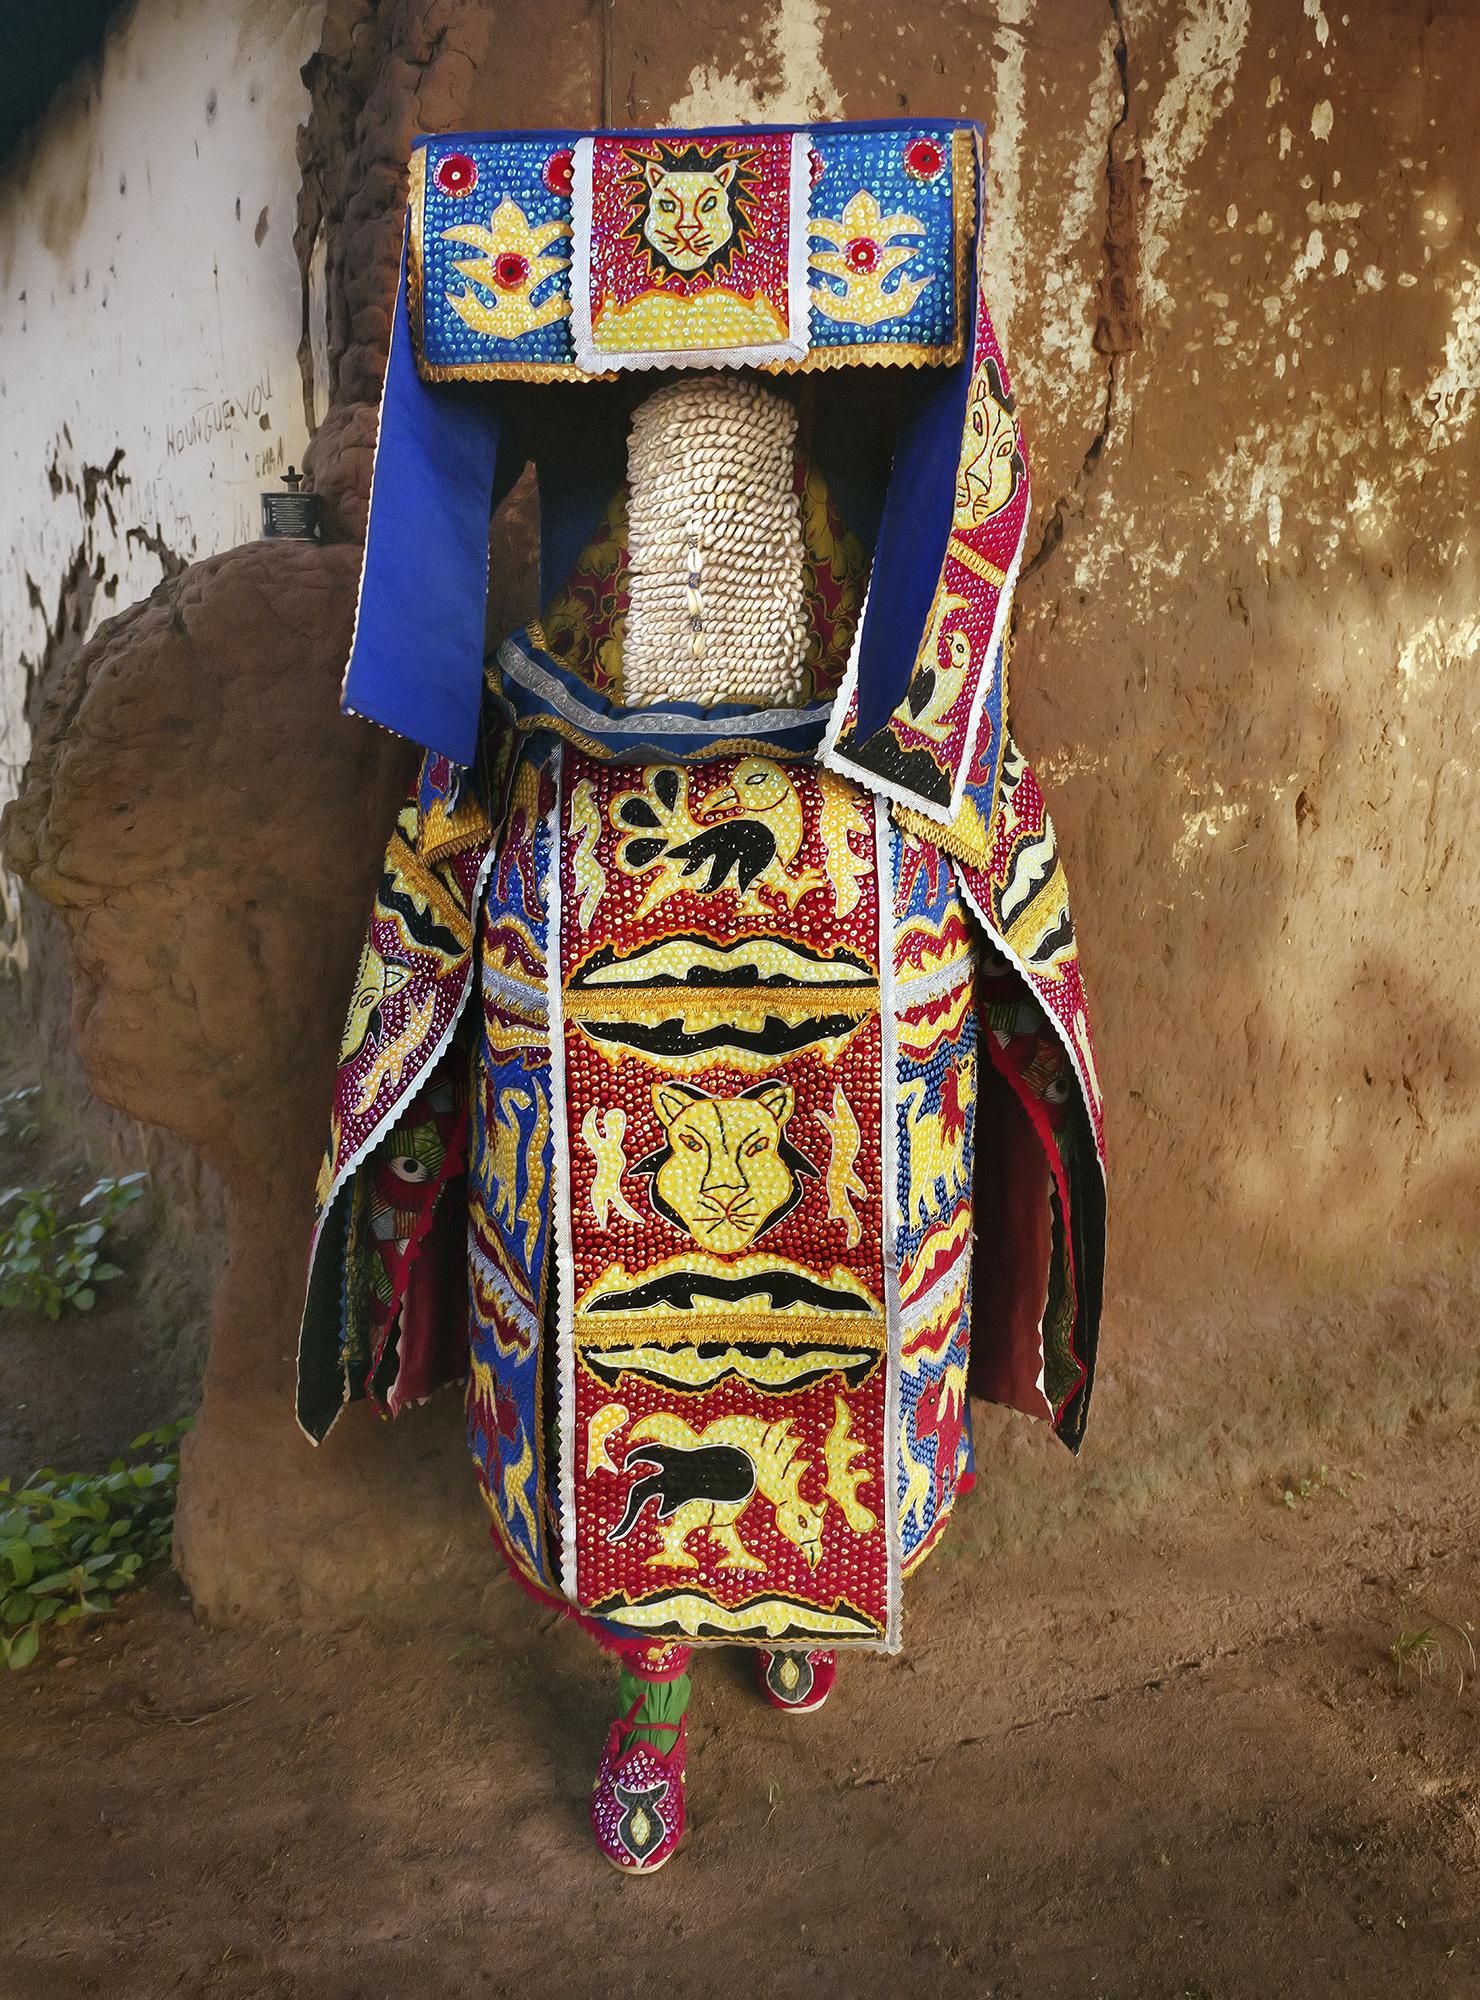 Leonce Raphael Agbodjelou_Egungun Masquerade XI_2015_Pigment Ink on HP Premium Satin Photographic Paper_148 x 110 cm